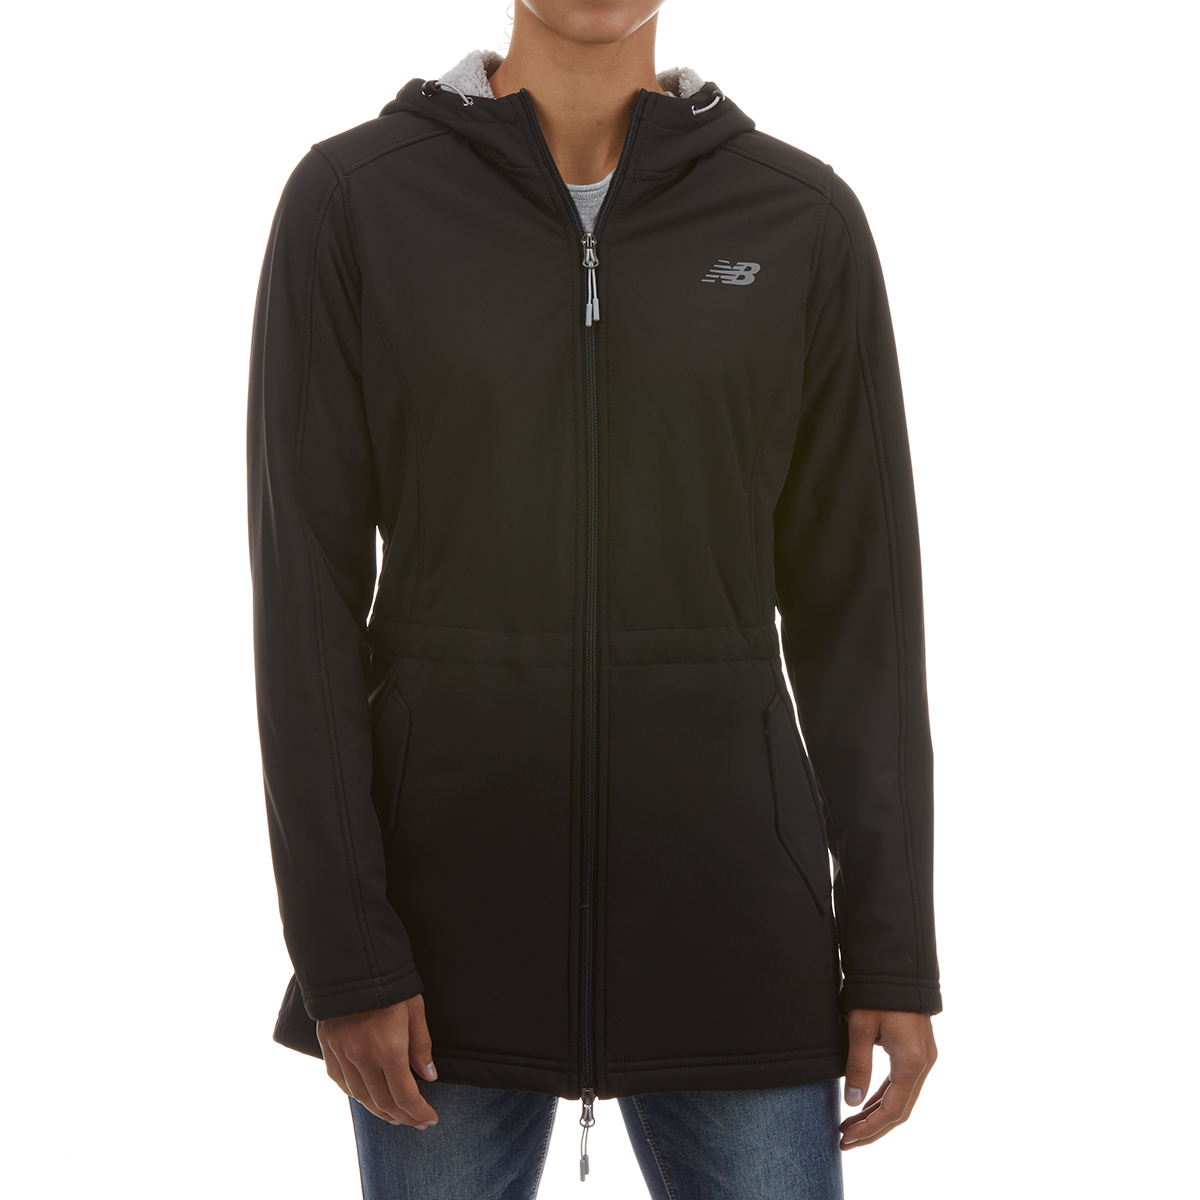 NEW BALANCE Women's Hooded Soft Shell Anorak Jacket with Sherpa Lining